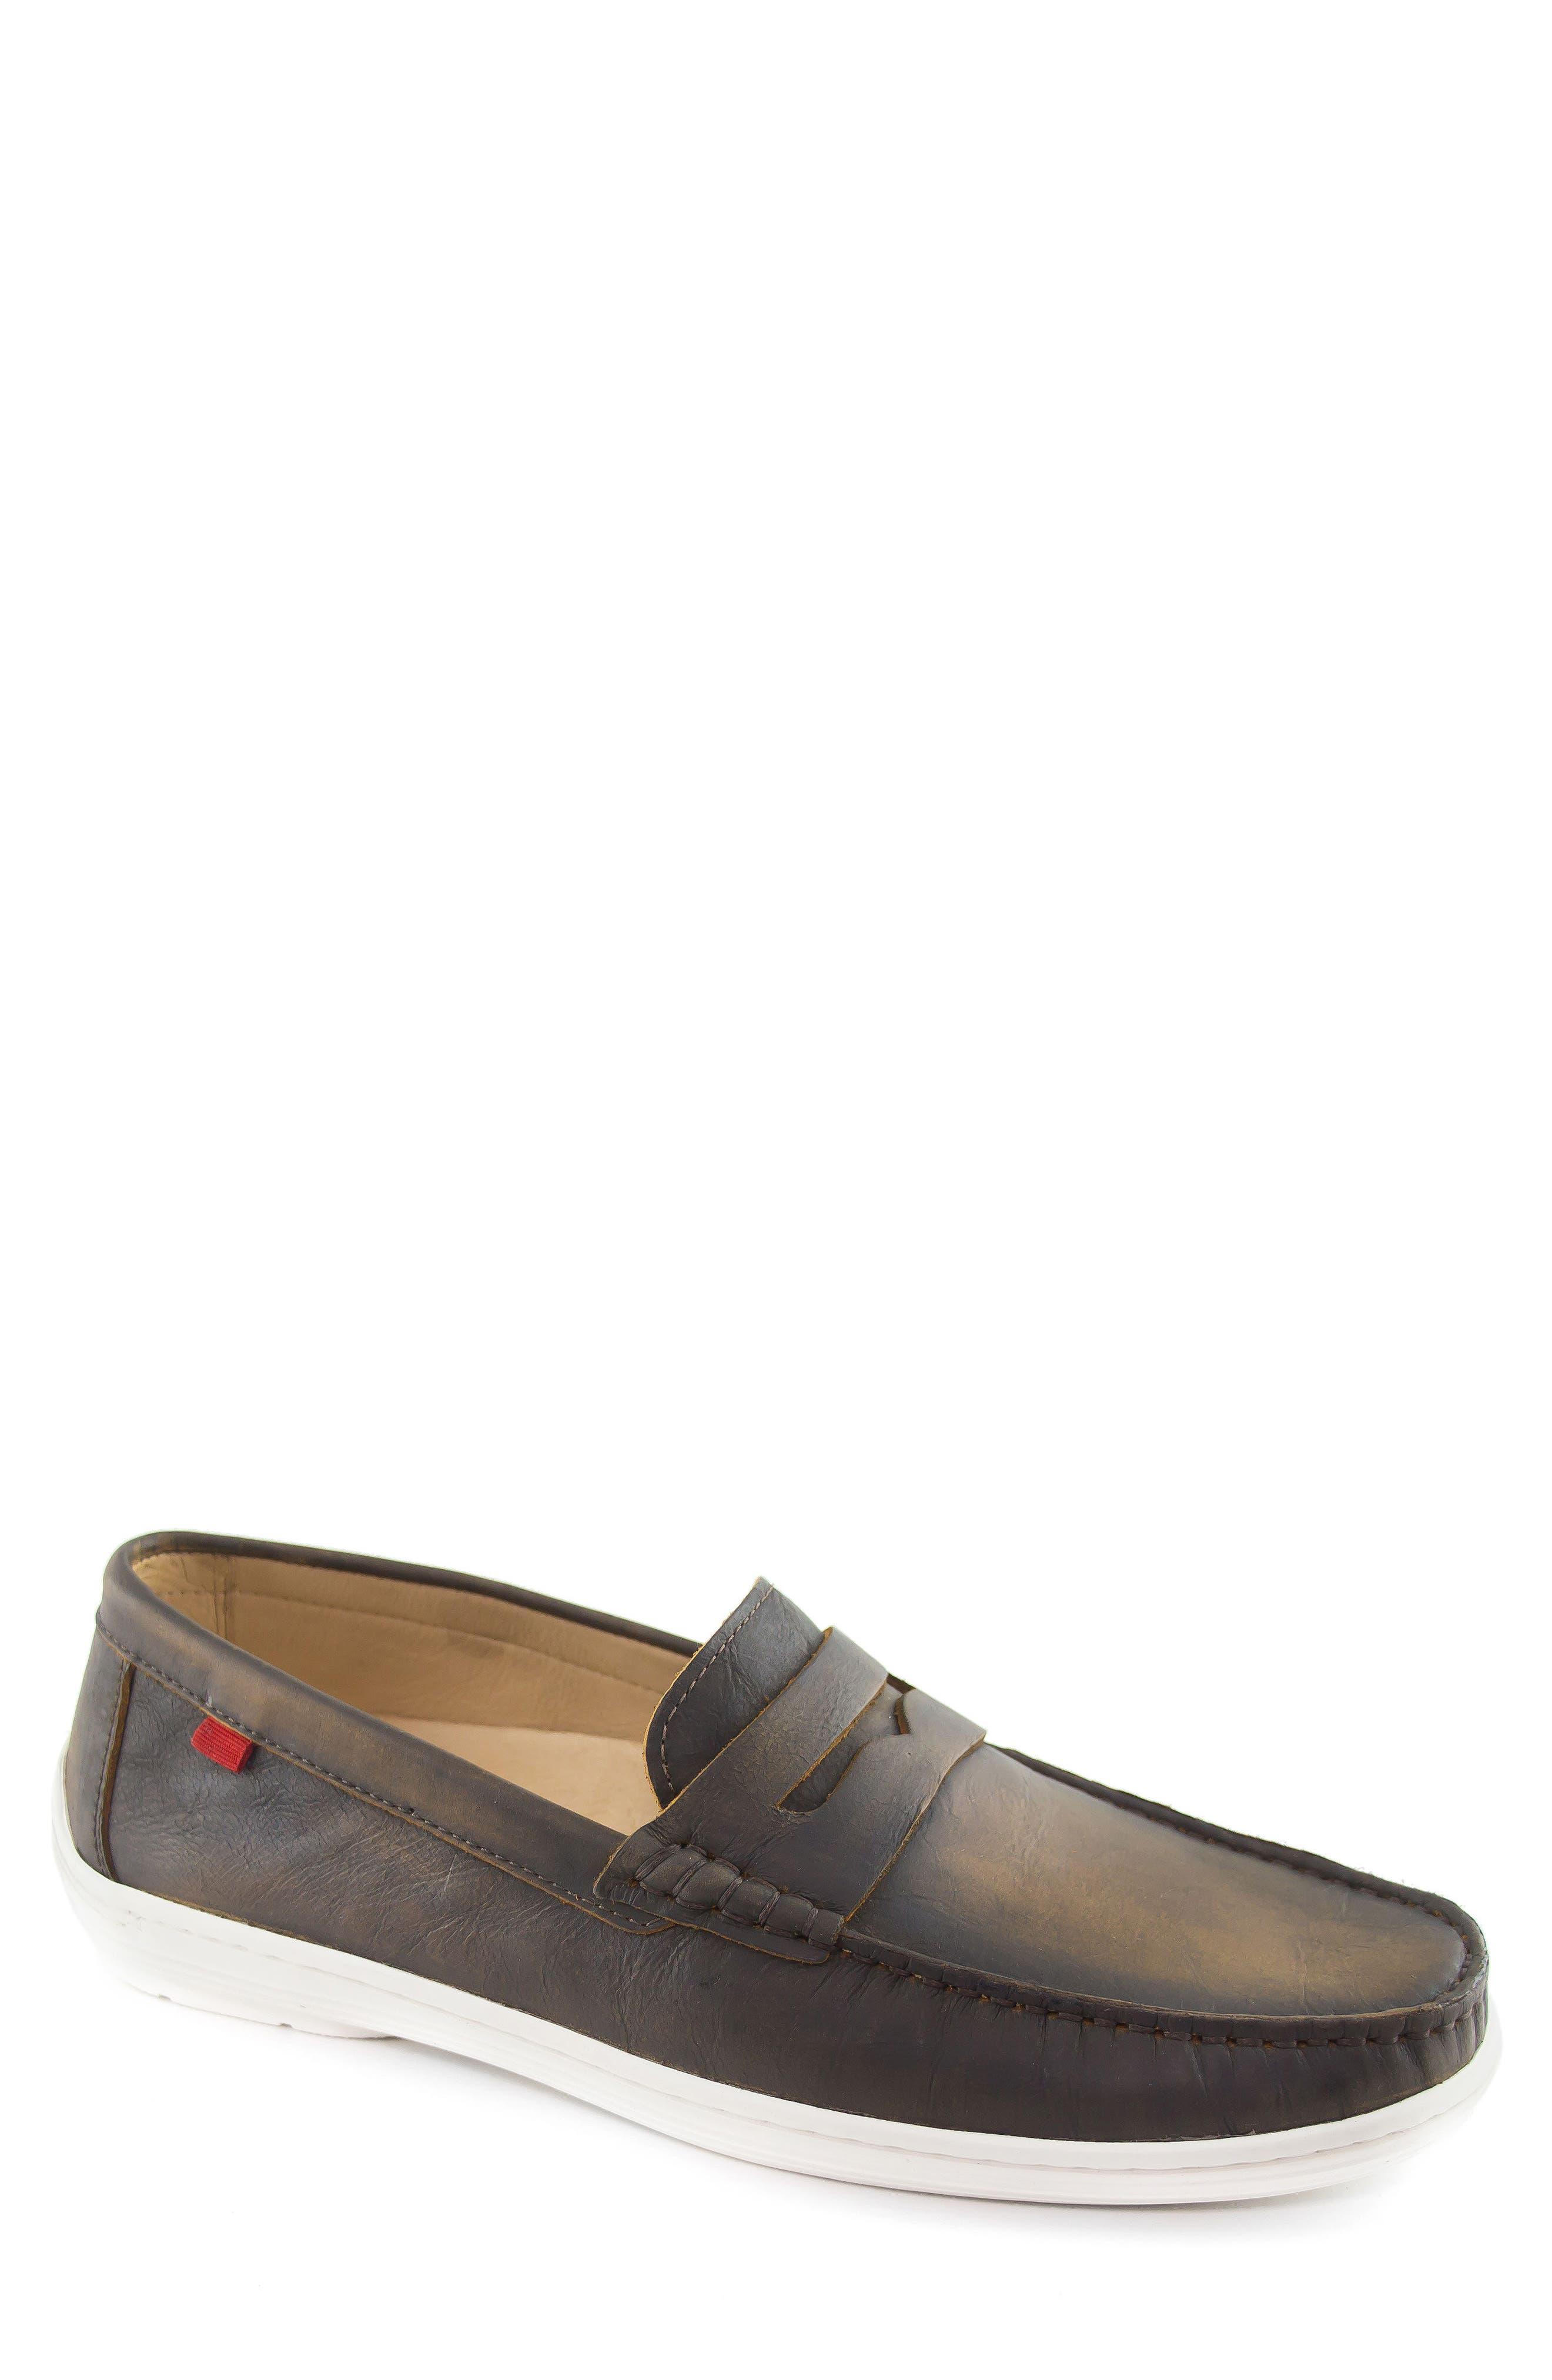 MARC JOSEPH NEW YORK Atlantic Penny Loafer, Main, color, 206